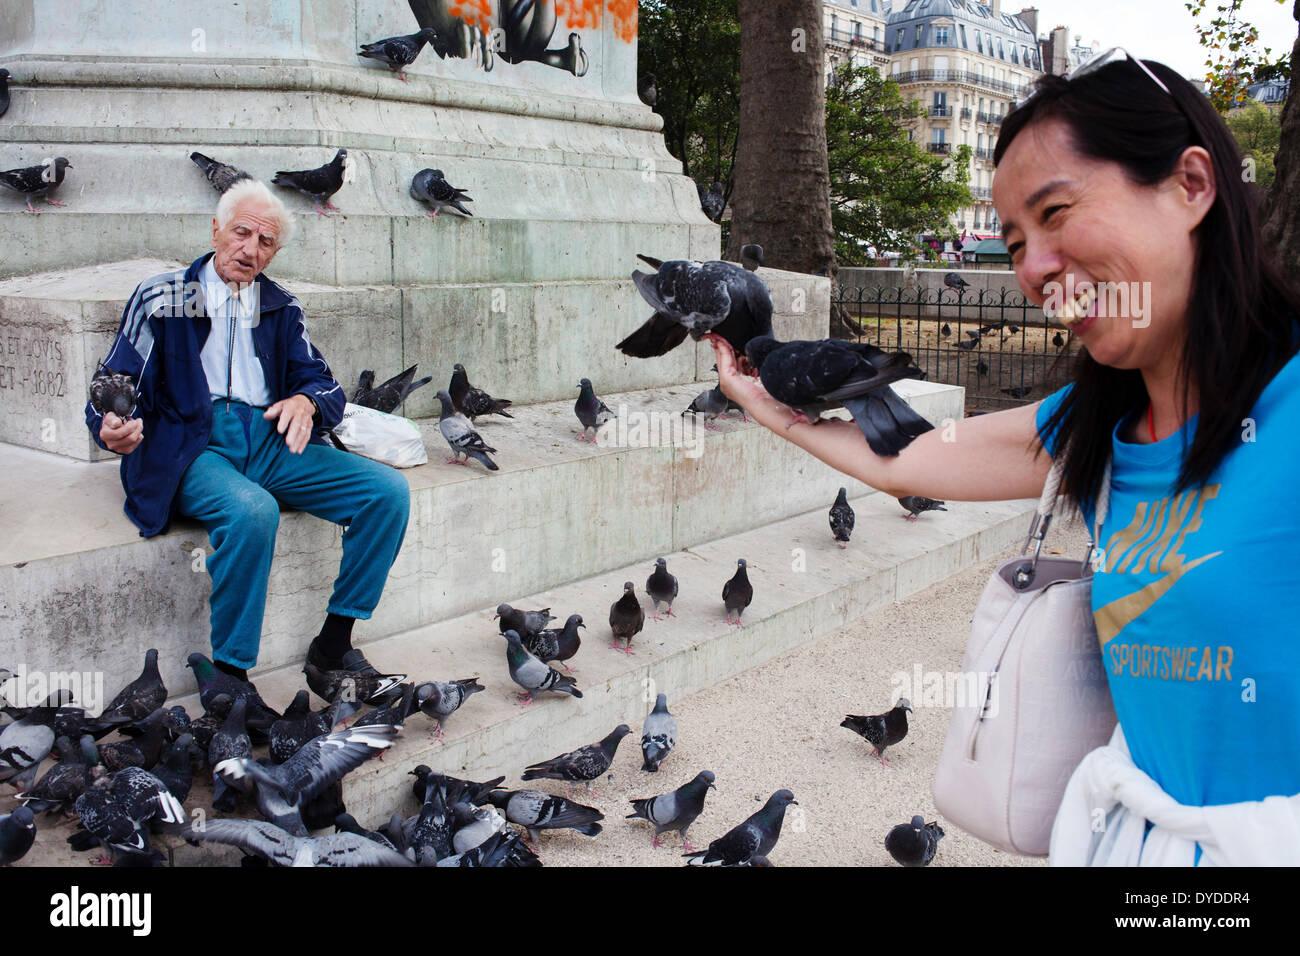 A French man and a tourist around Notre Dame de Paris. - Stock Image